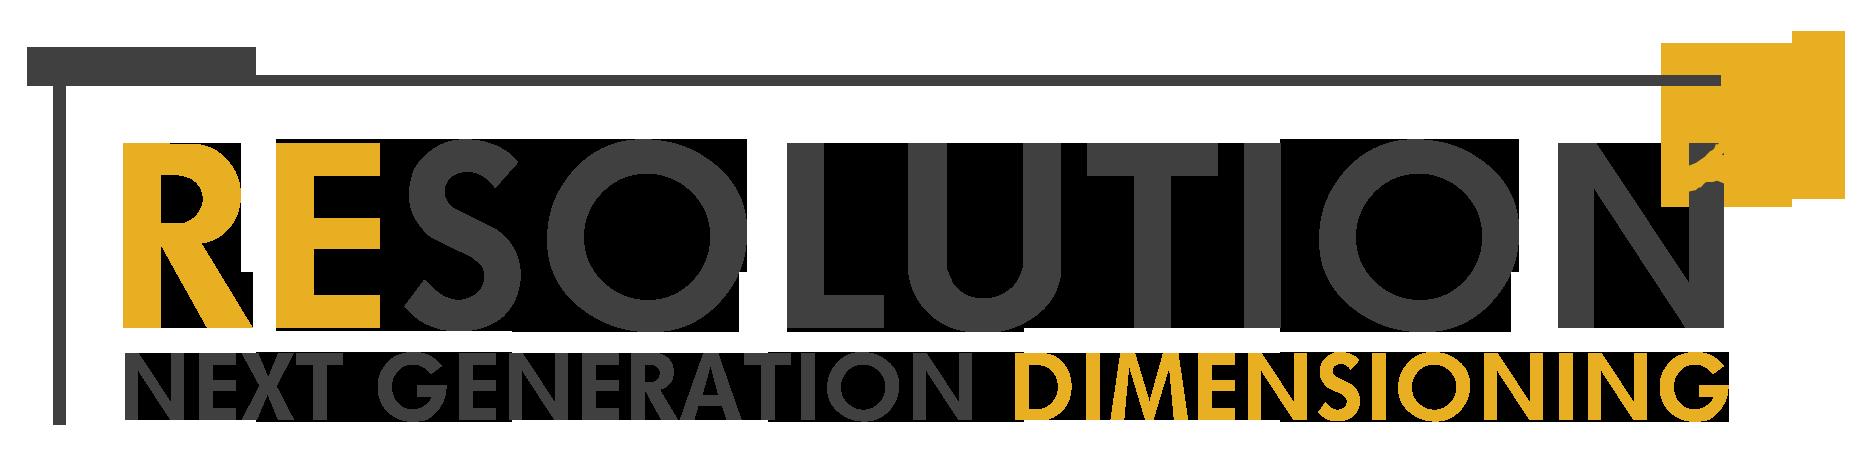 Resolution 2 Dimensioner Logo